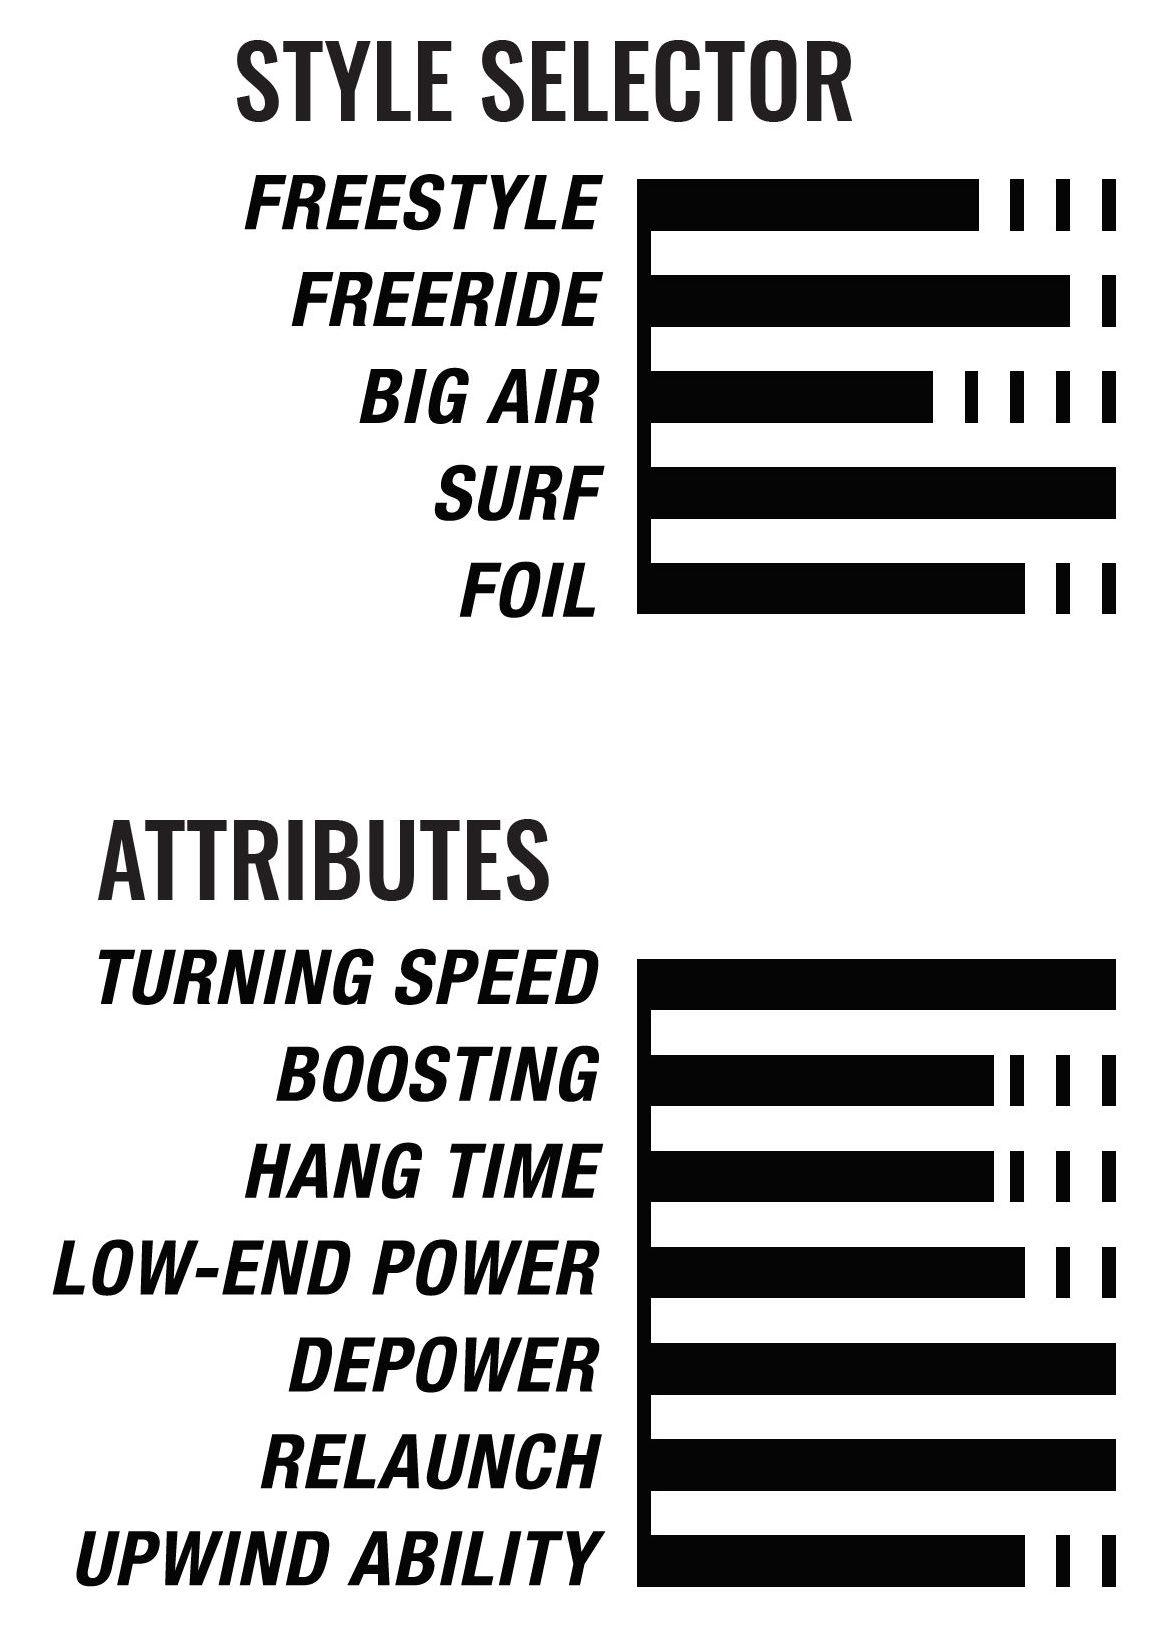 2020 Cabrinha Drifter Kiteboarding Kite attributes